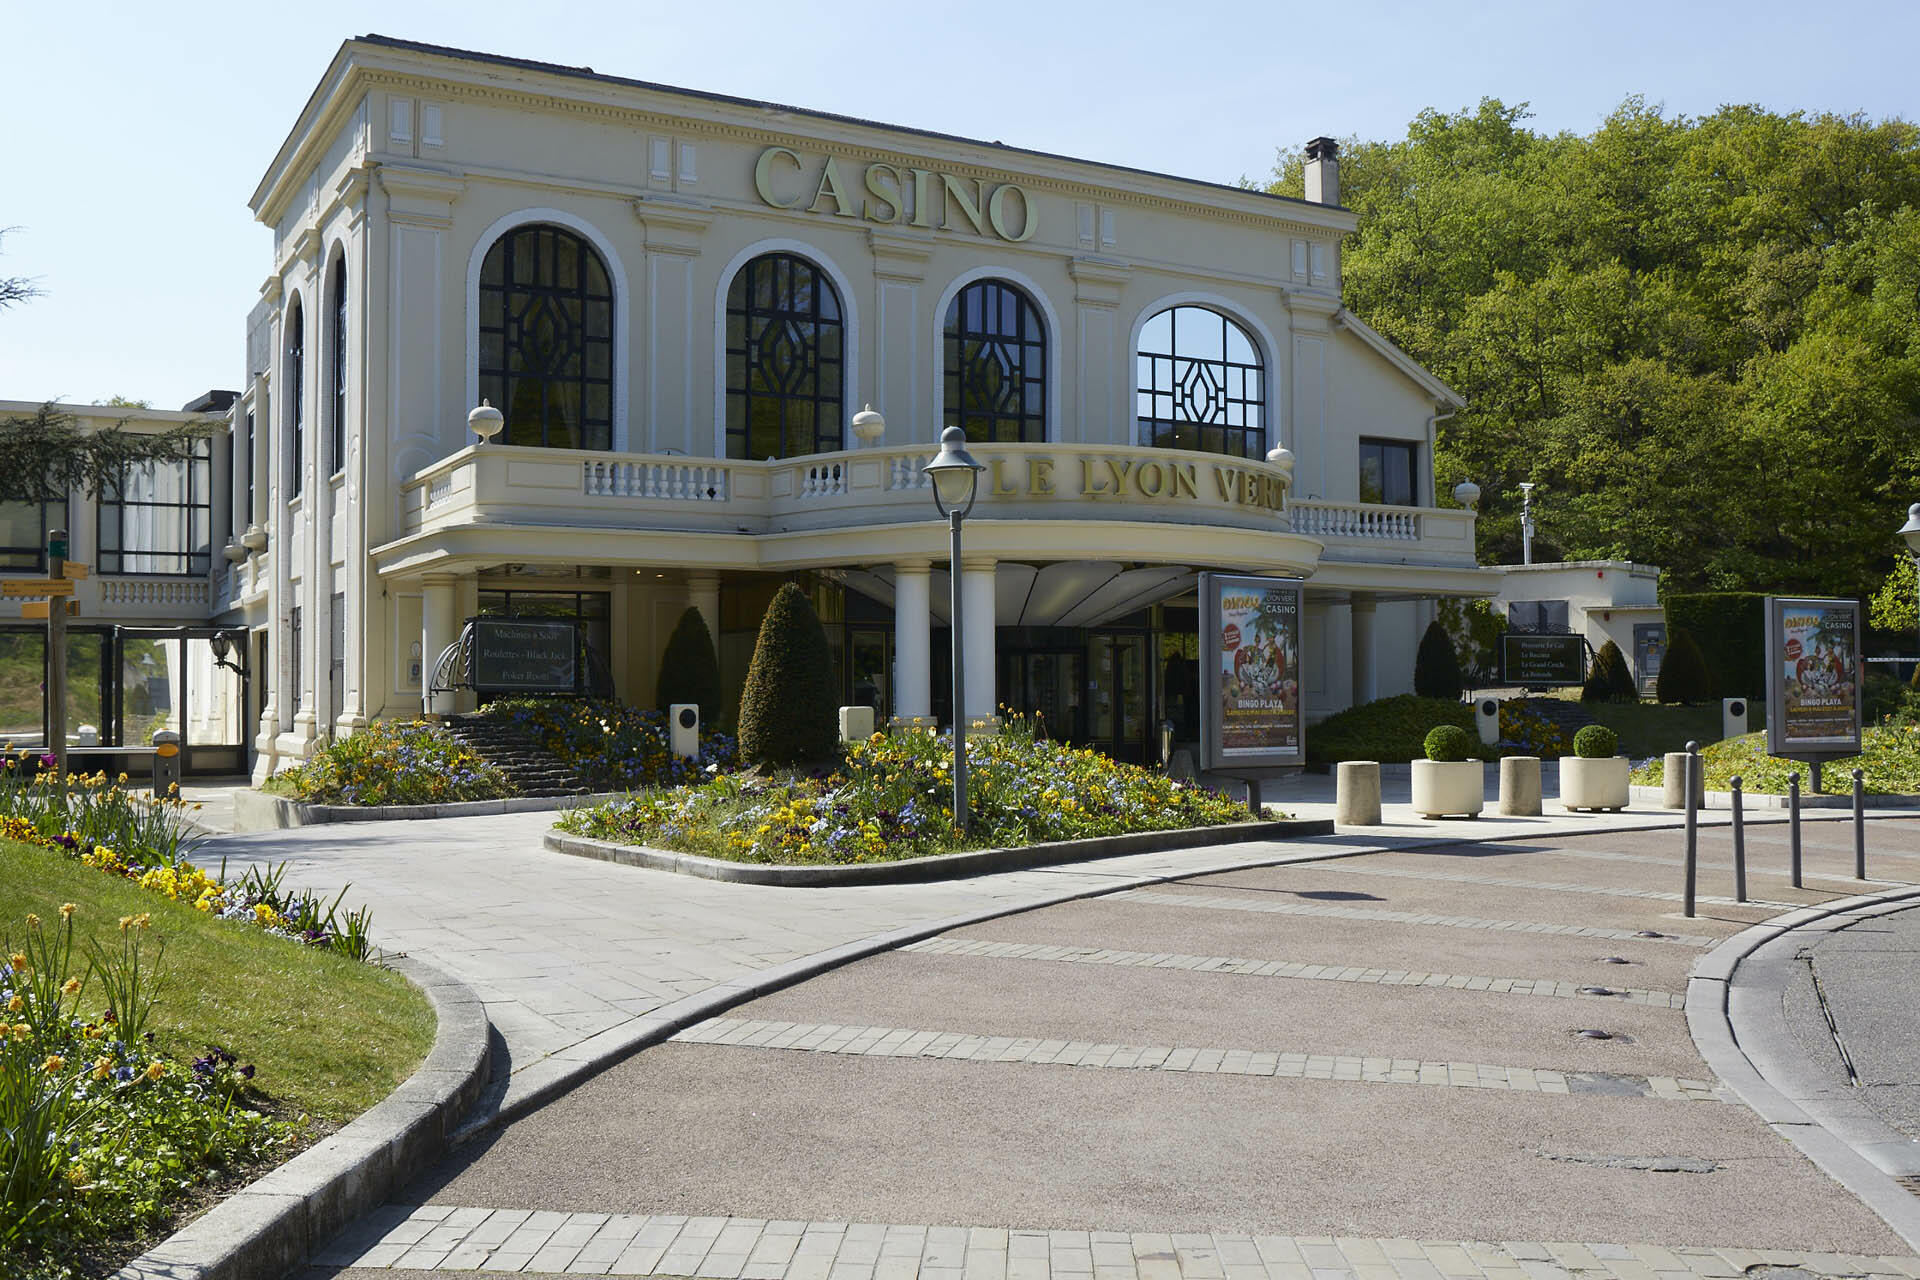 Casino at Hotel & Spa Le Pavillon near Lyon